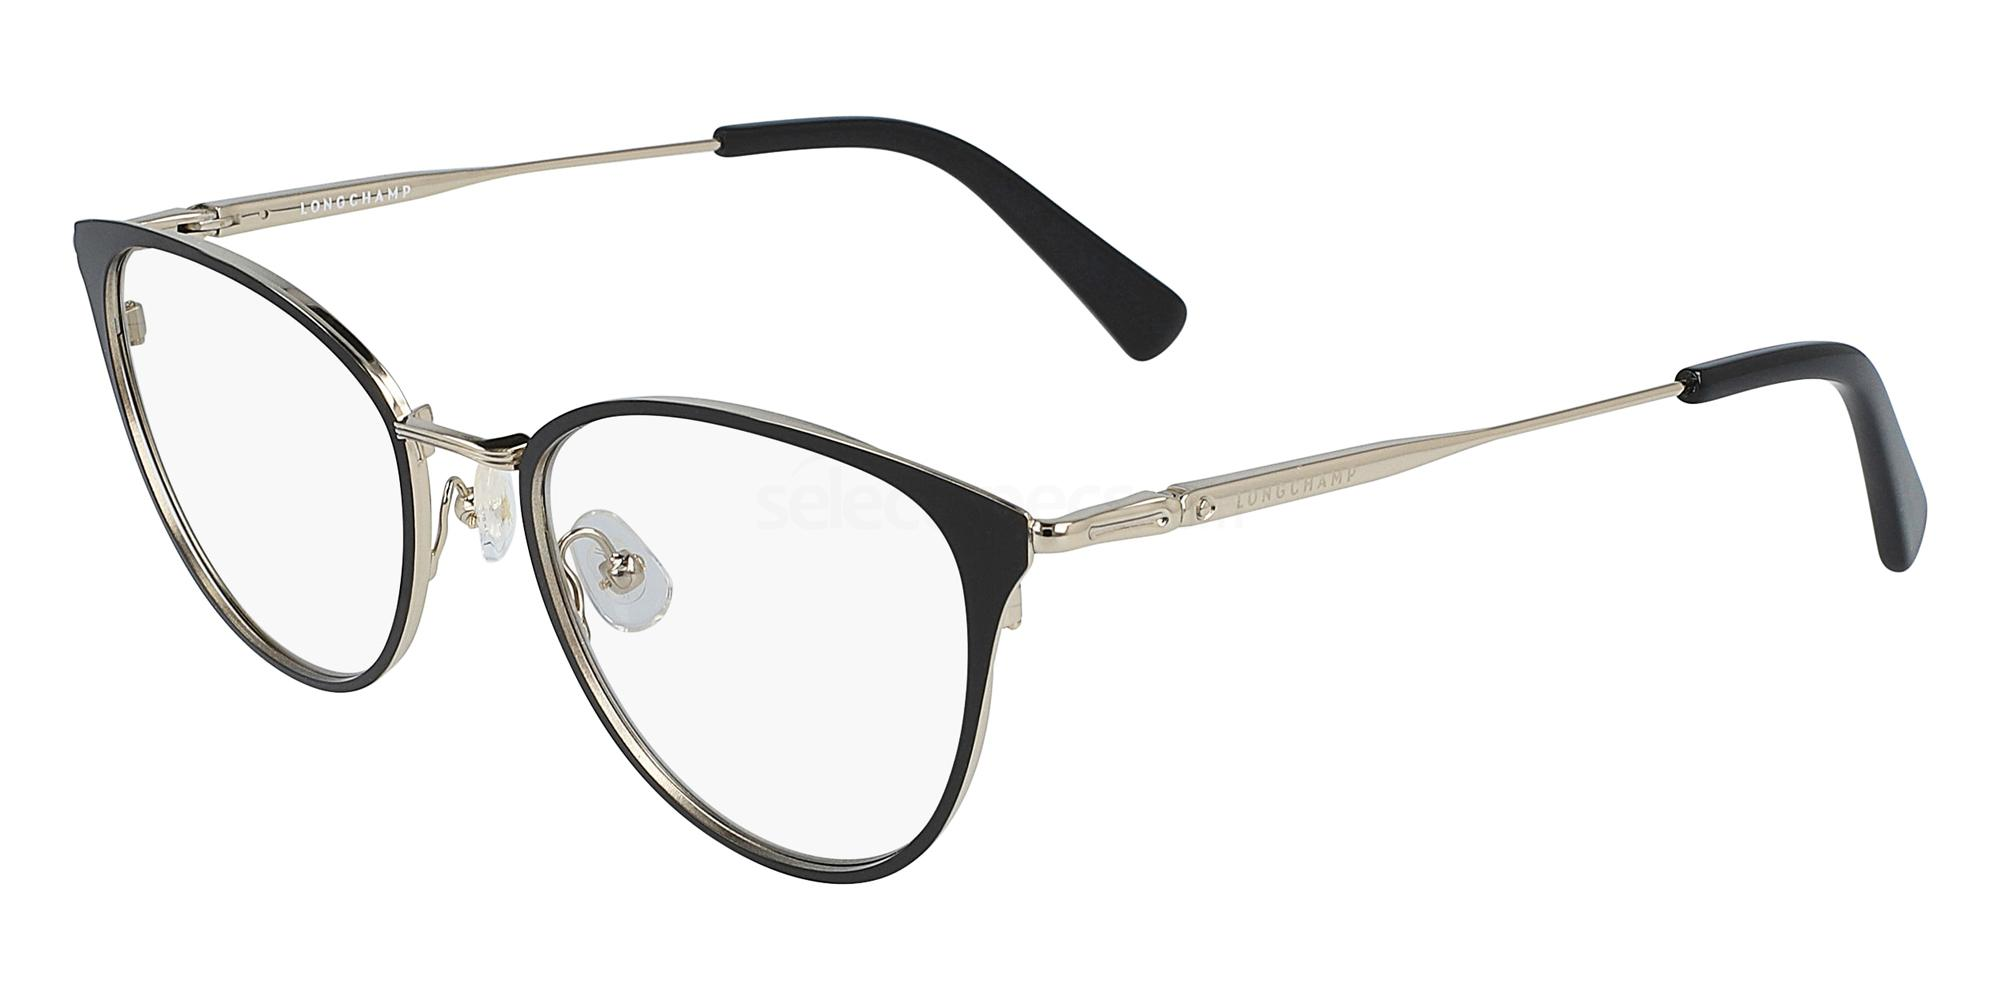 001 LO2124 Glasses, LONGCHAMP